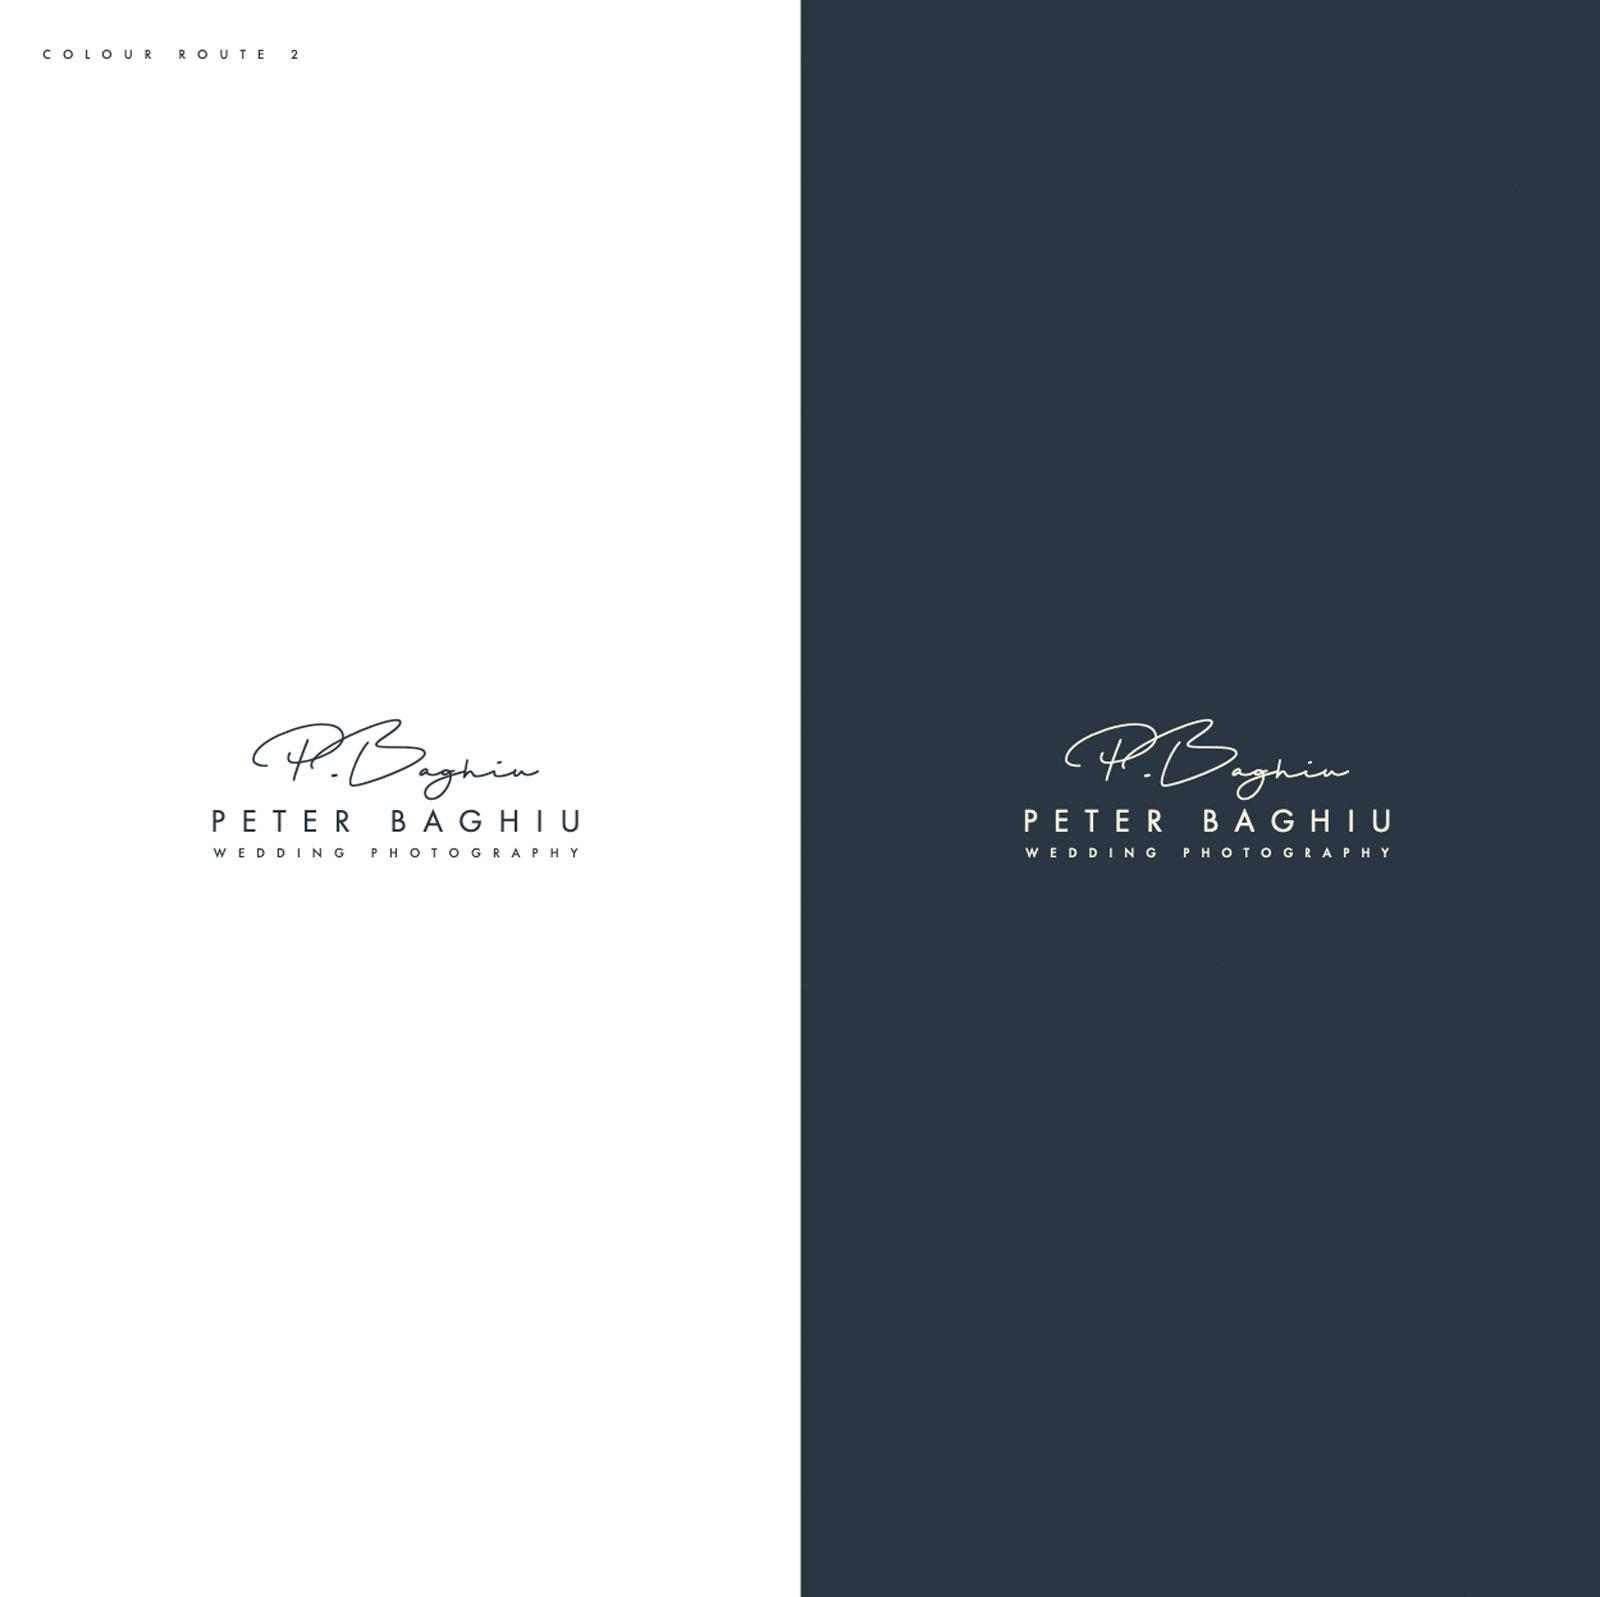 wedding-photographer-logo-design-04